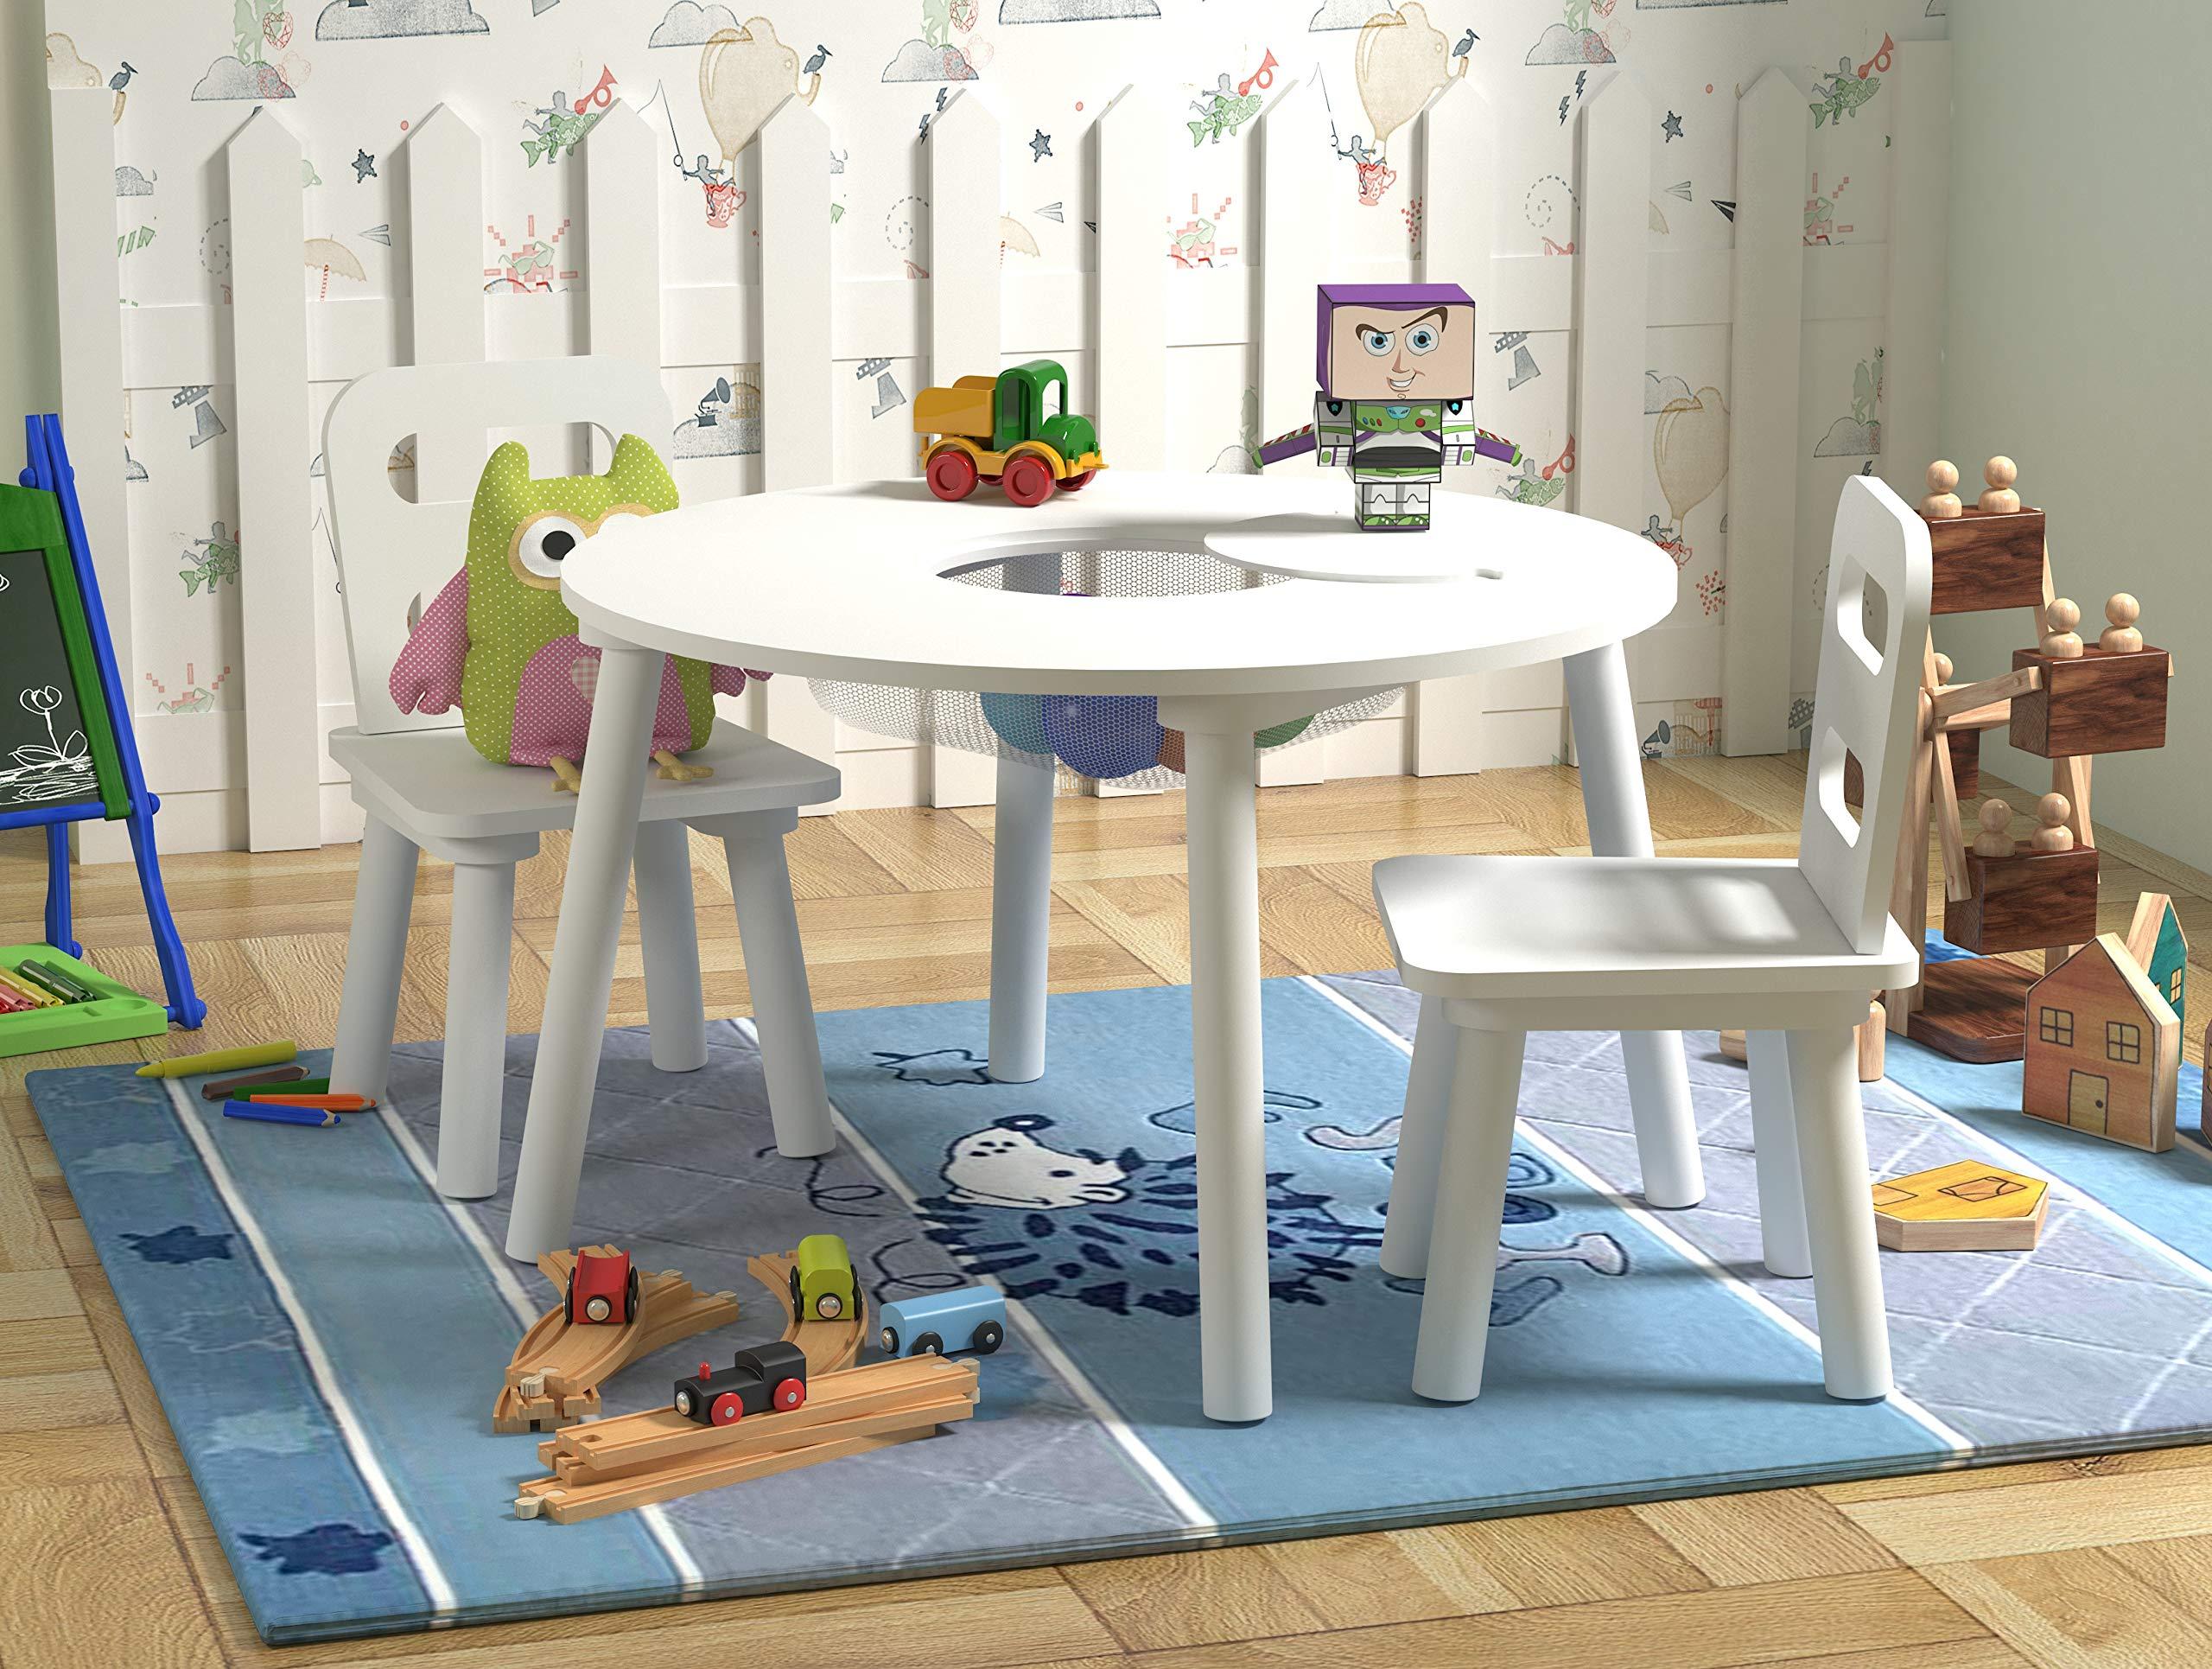 B Spaces By Battat 168 C Kid Century Modern Trendy Toddler